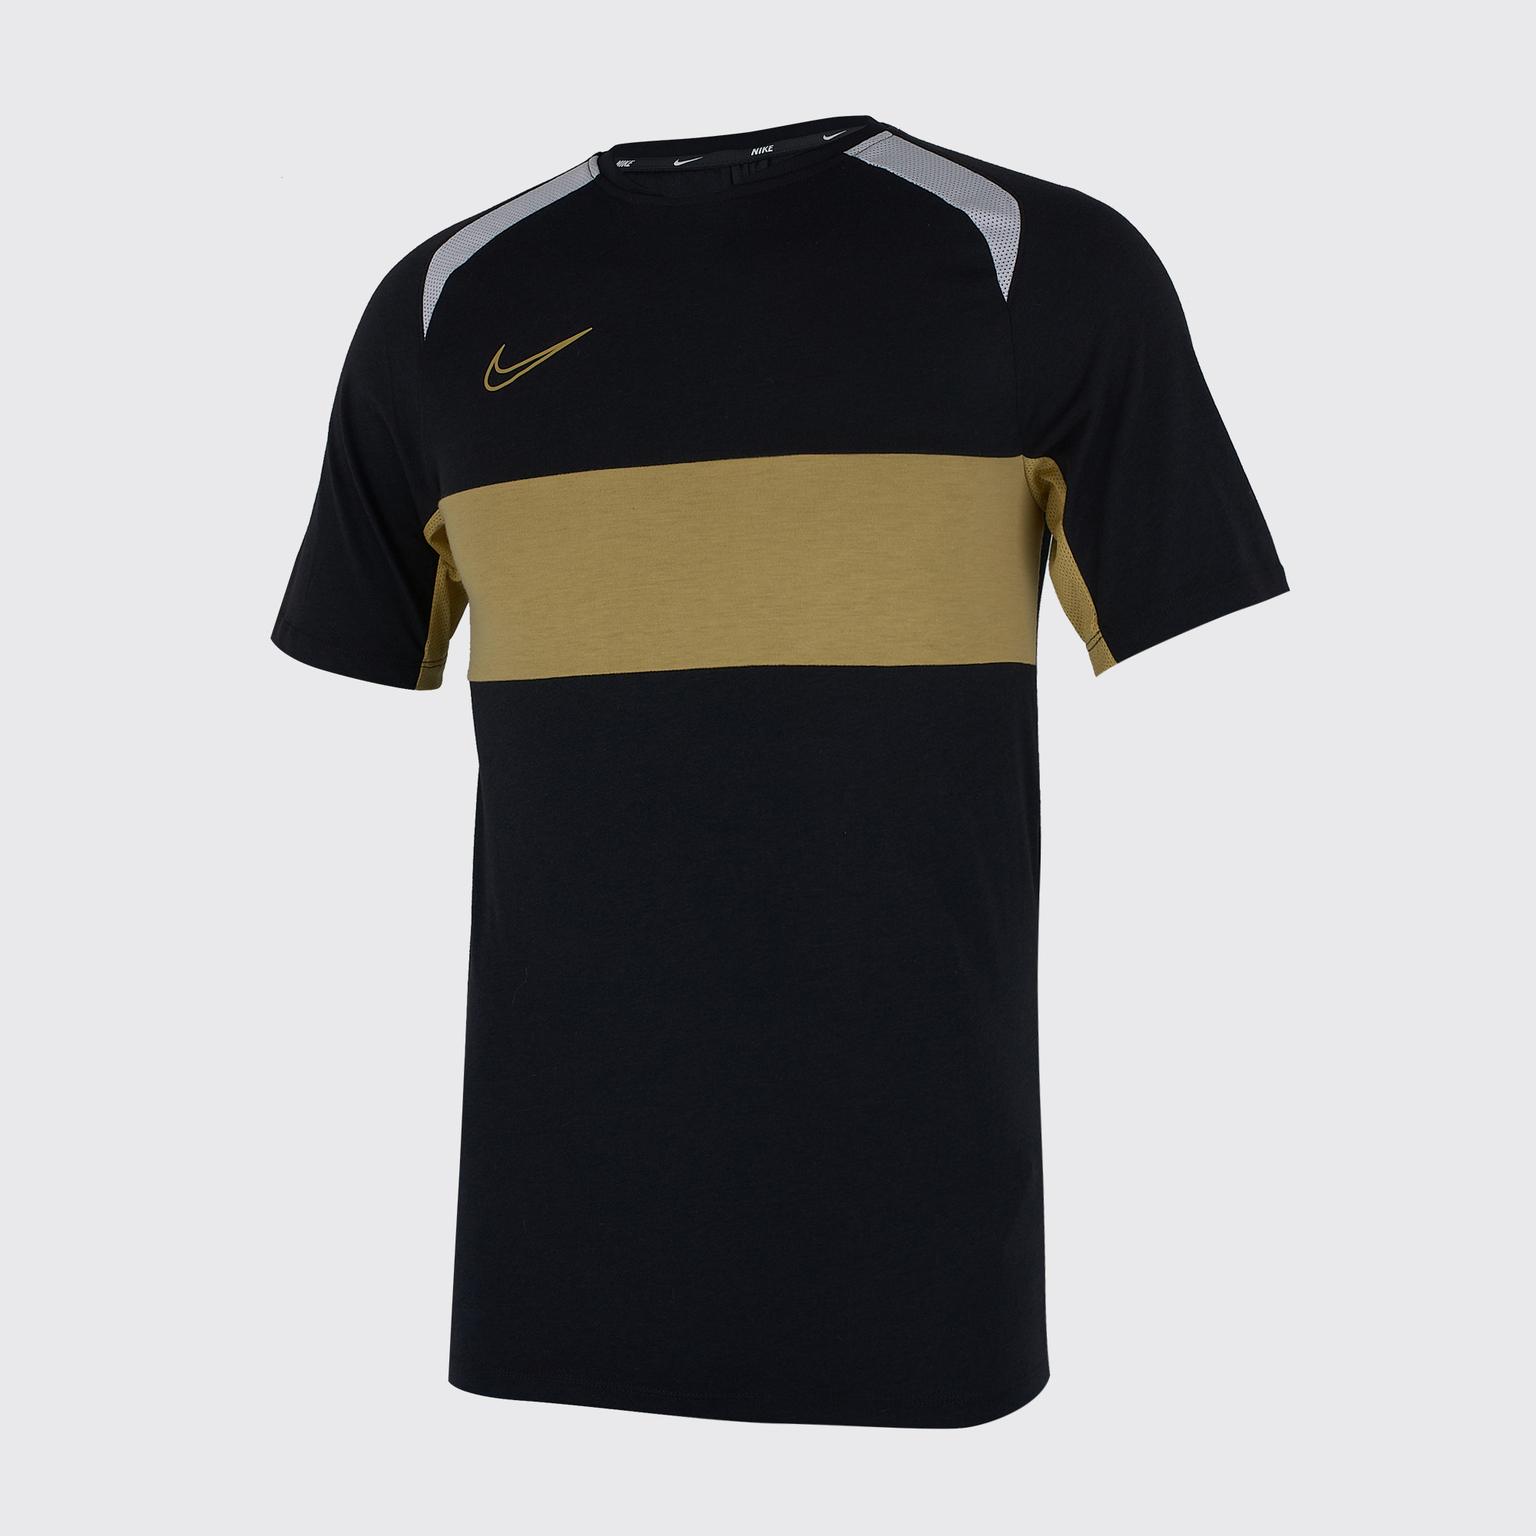 цена Футболка тренировочная Nike Dry Academy Top BQ7352-010 онлайн в 2017 году